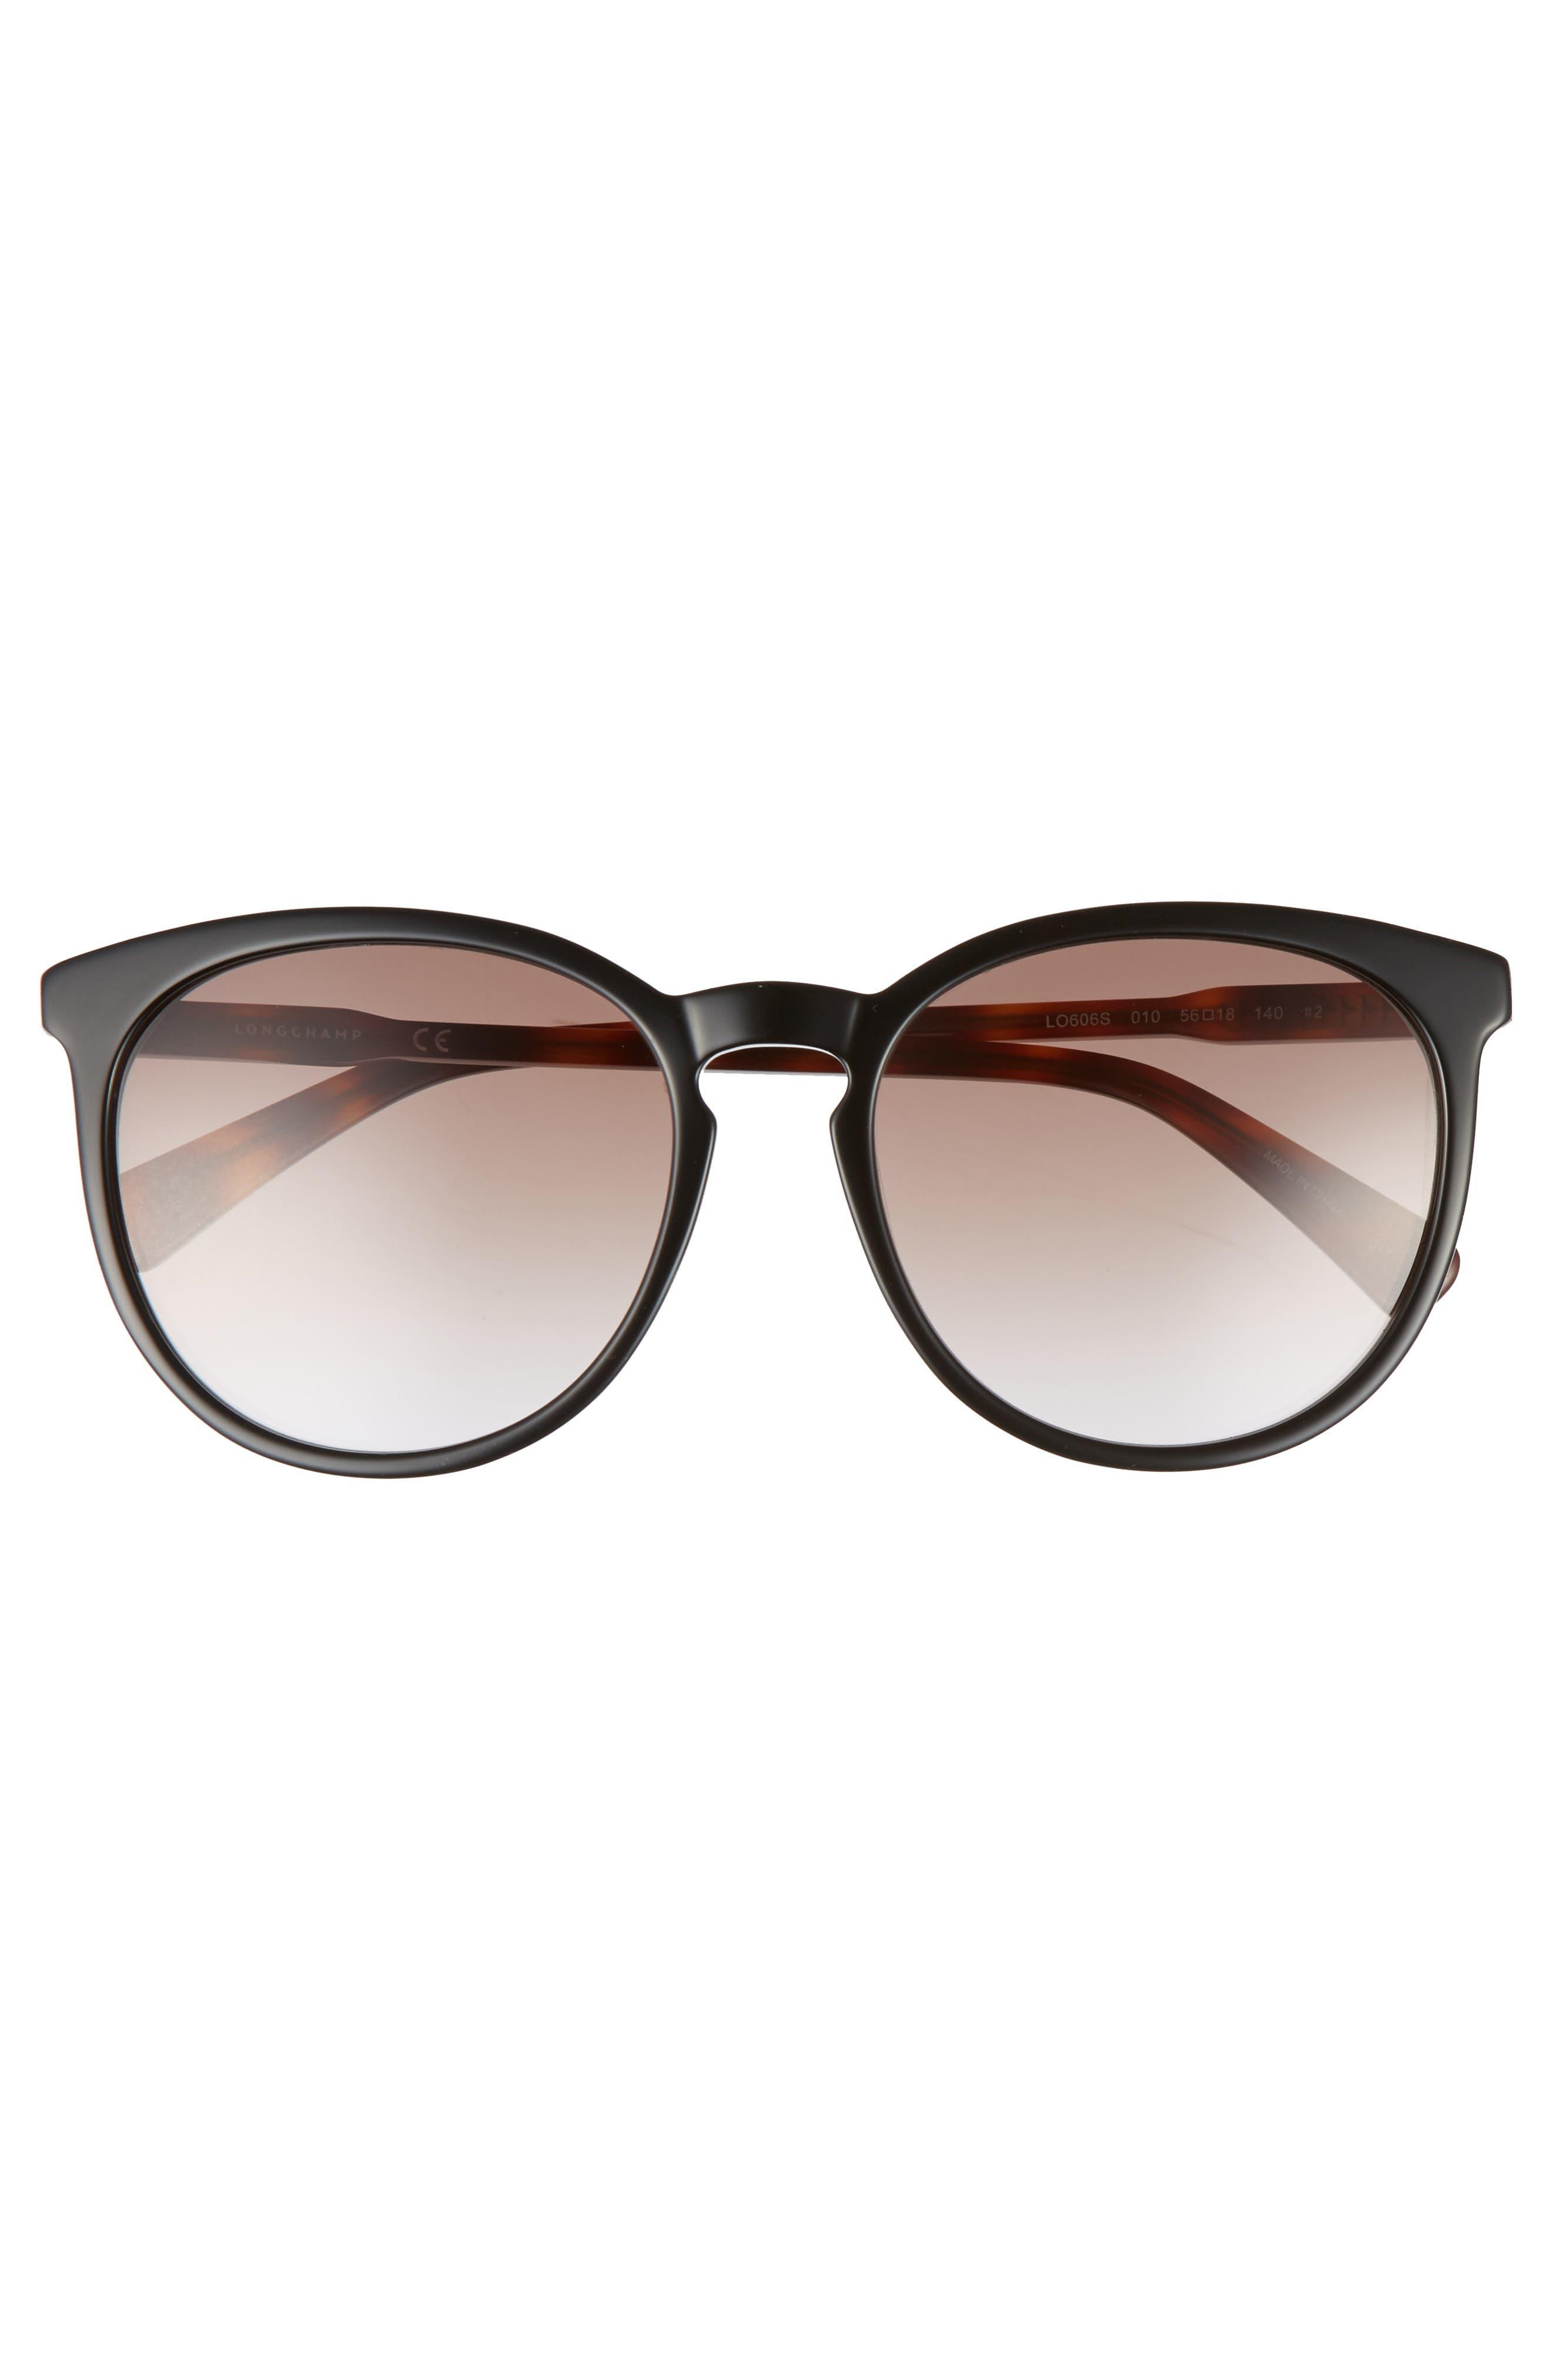 56mm Round Sunglasses,                             Alternate thumbnail 3, color,                             BLACK/ HAVANA